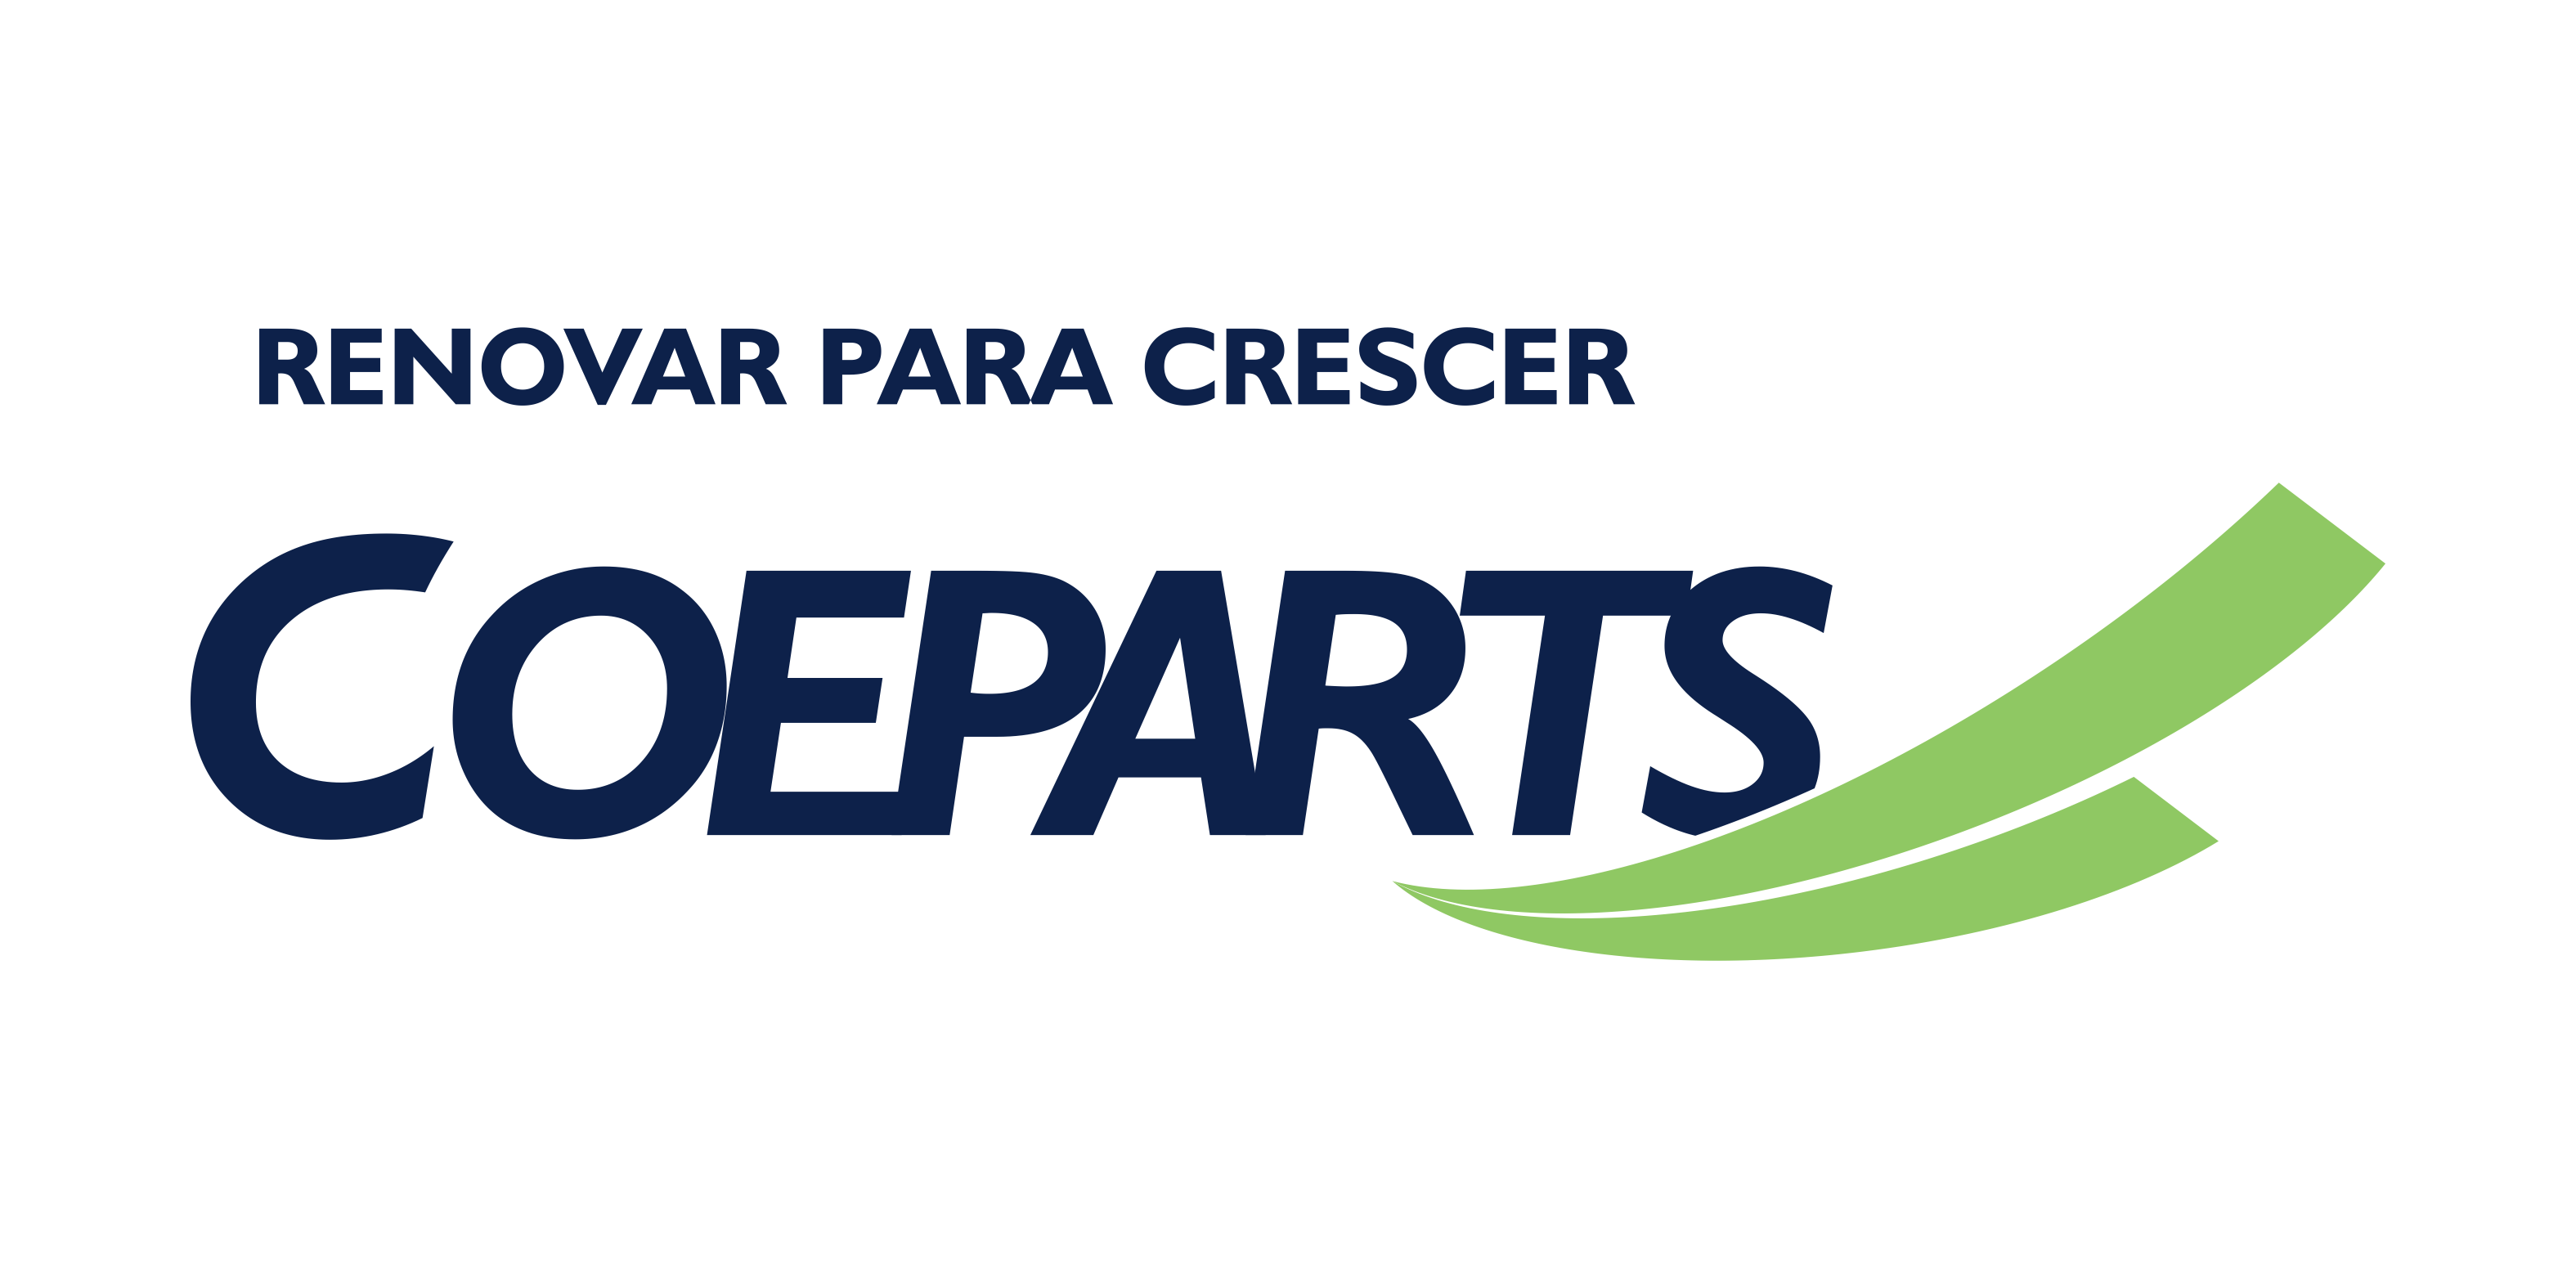 Coeparts